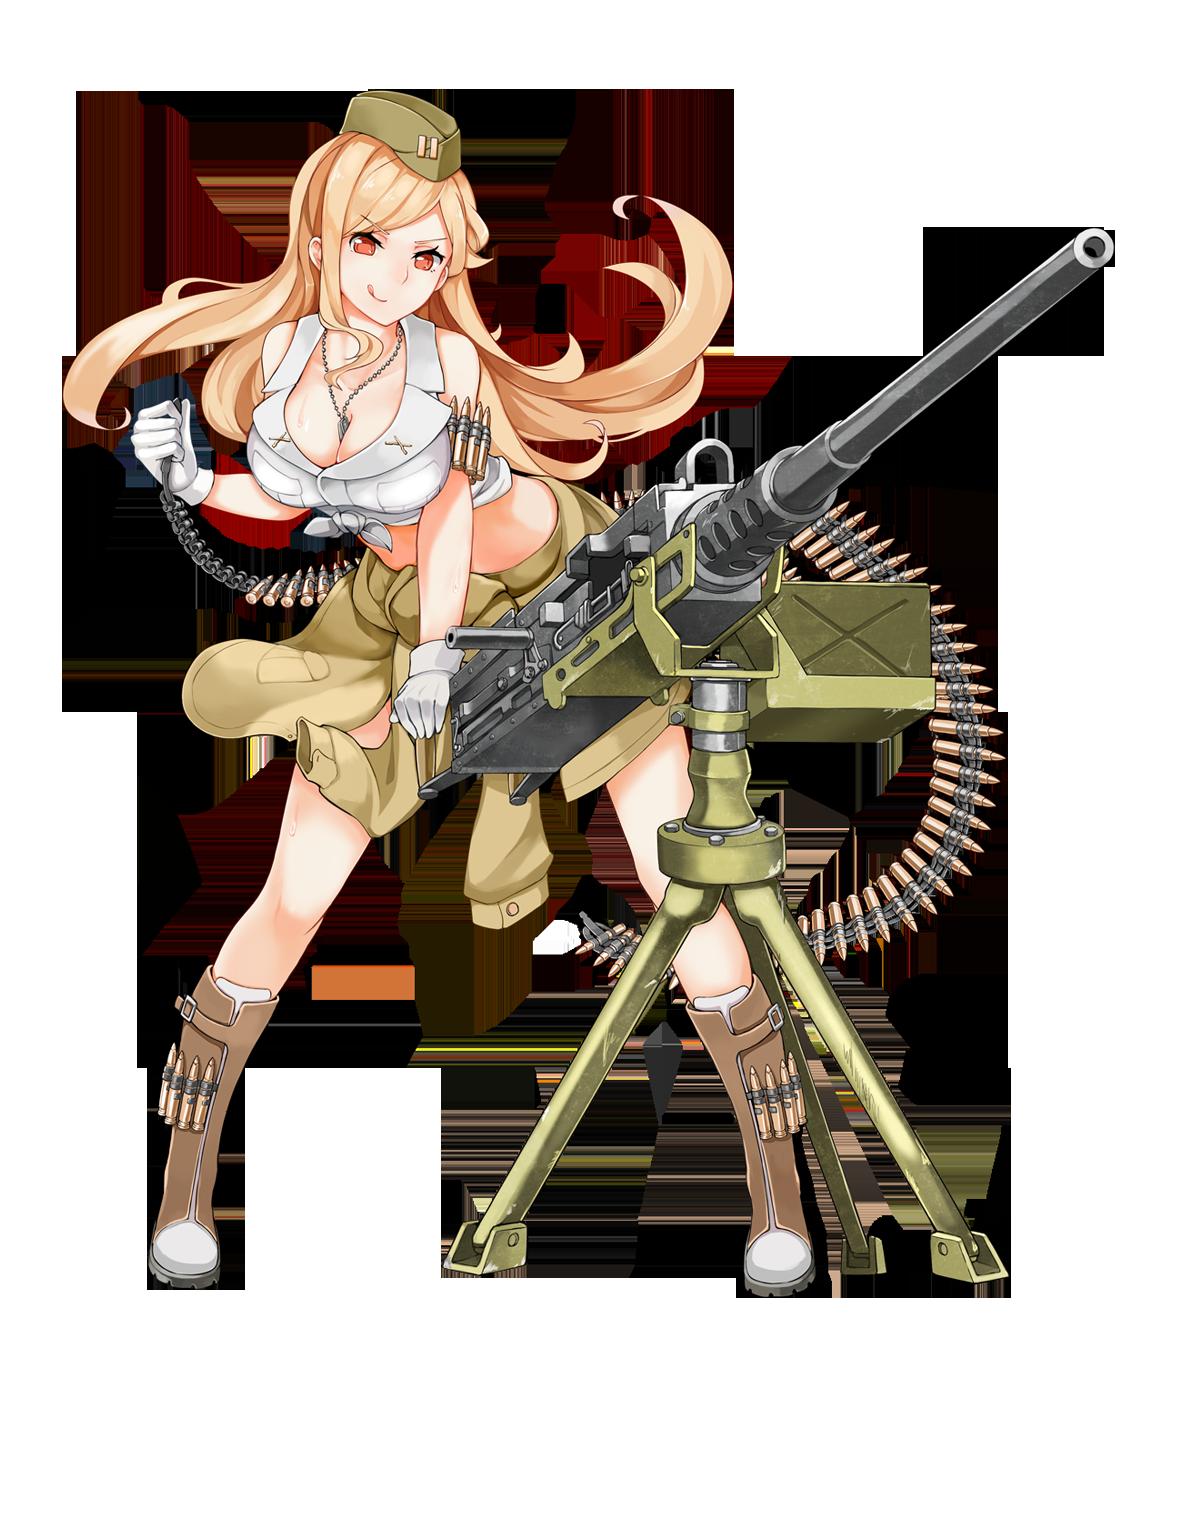 M10HB  Girls frontline, Anime military, Cartoon character design